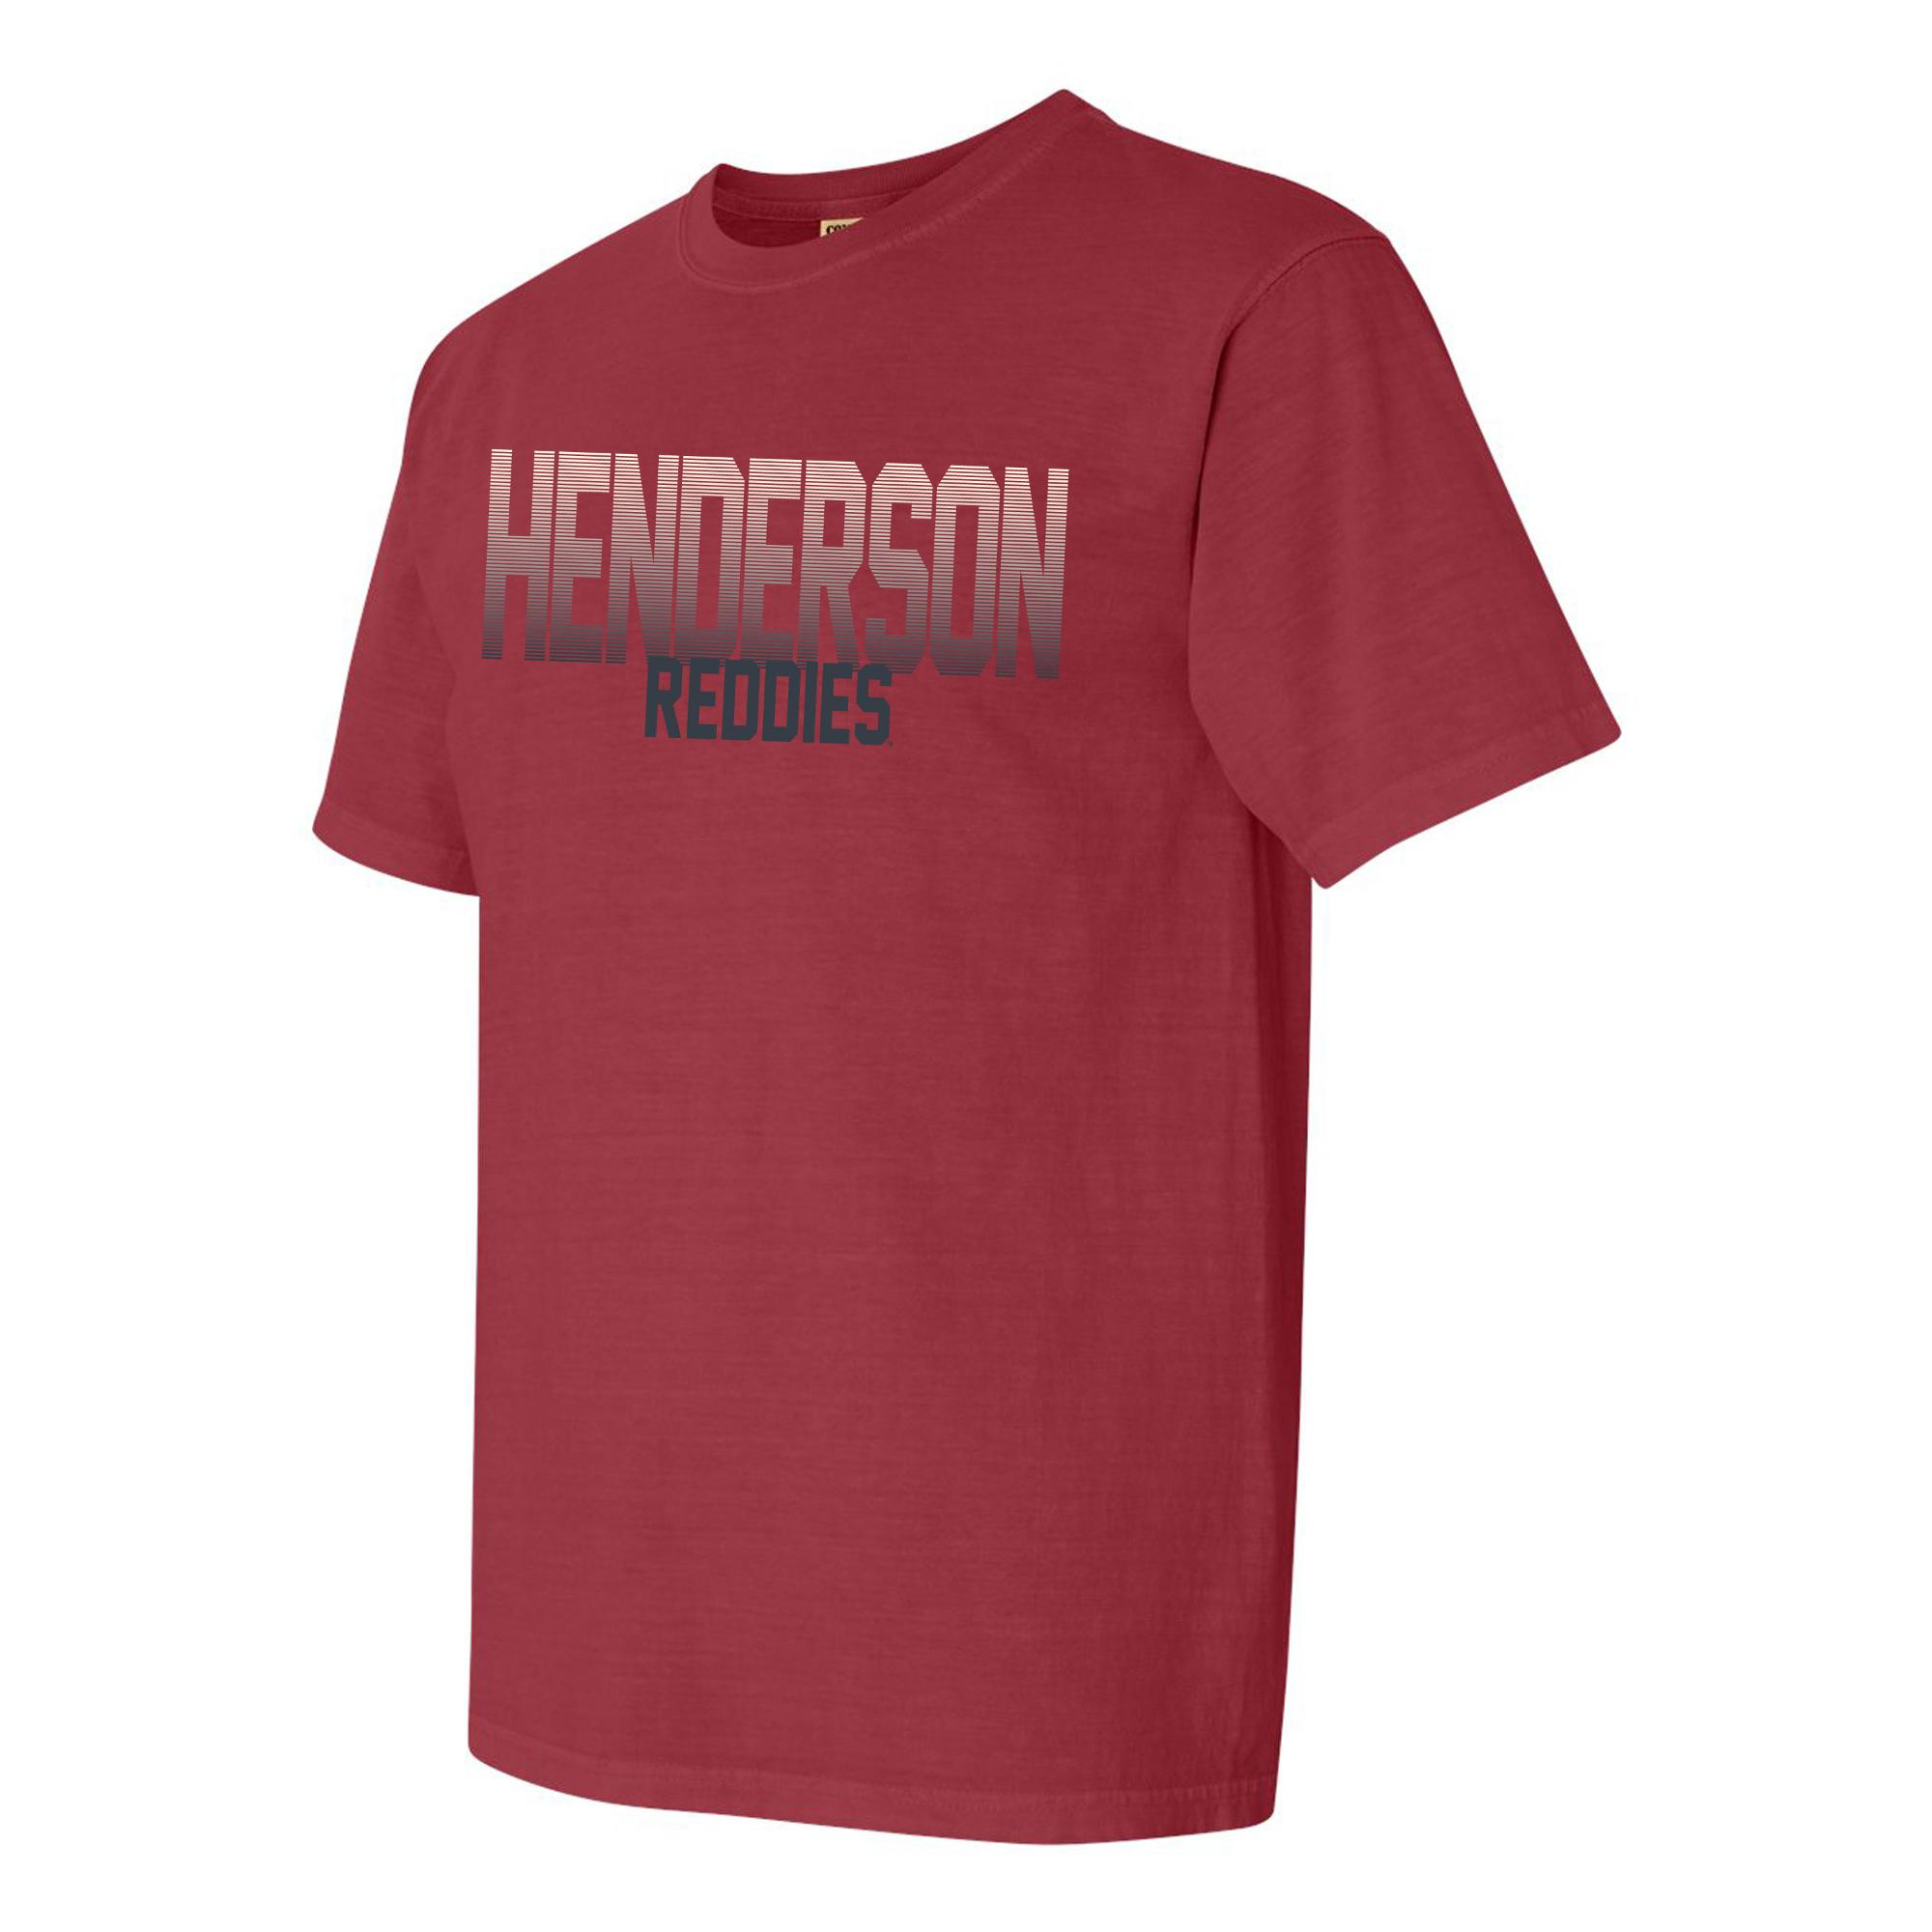 image of: Henderson Reddies Fade Comfort Colors Short Sleeve T-Shirt